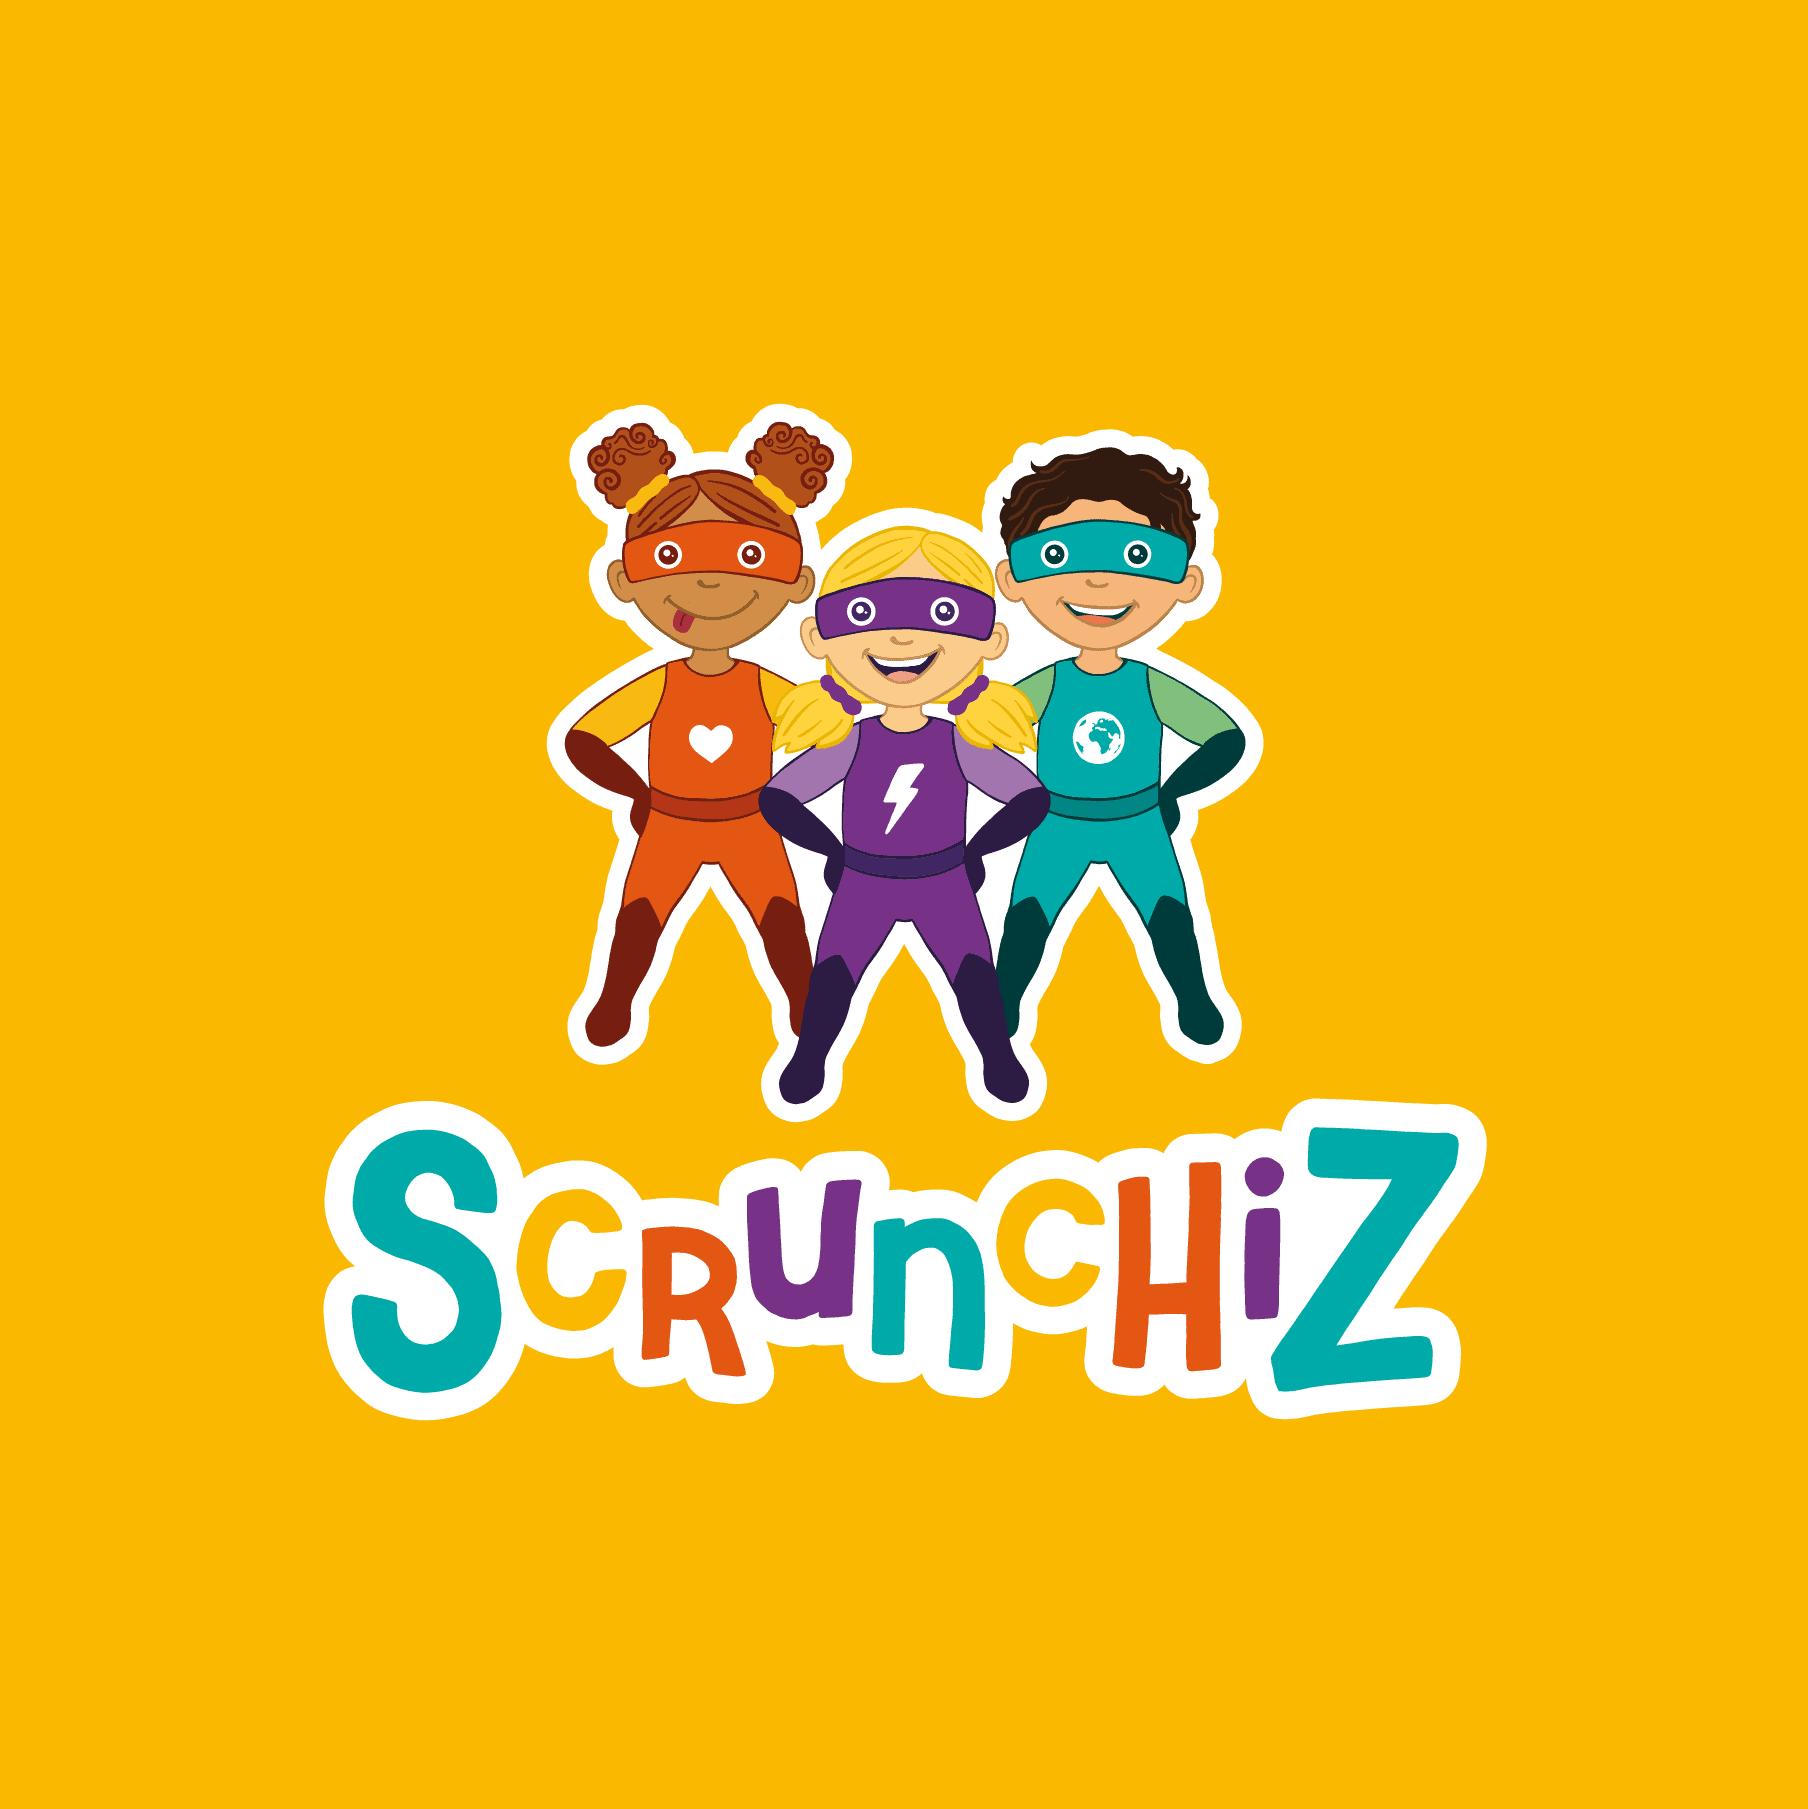 SCRUNCHIZ